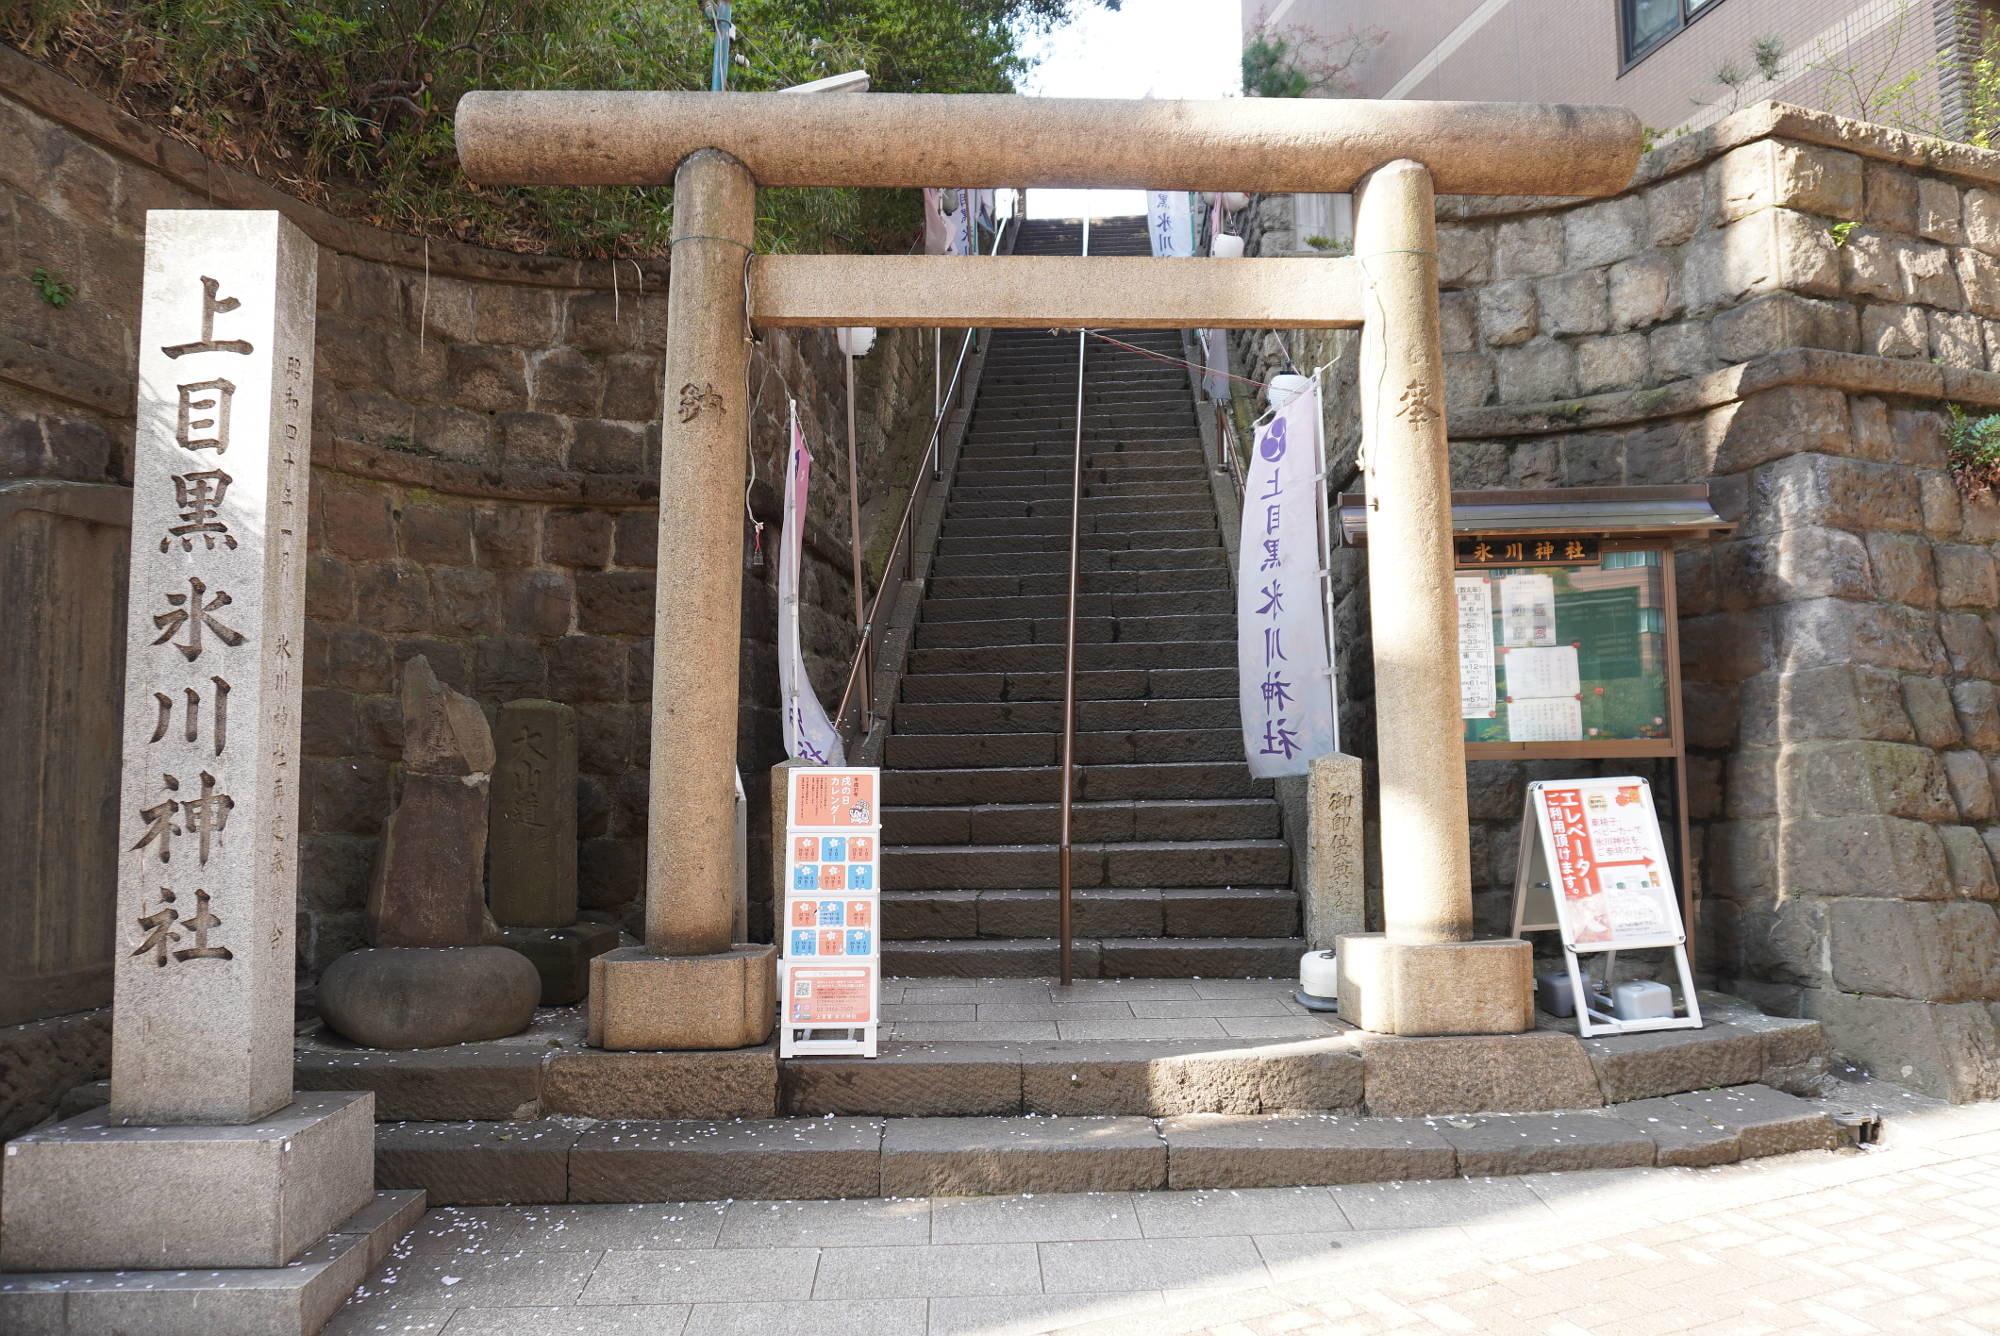 上目黒氷川神社の鳥居